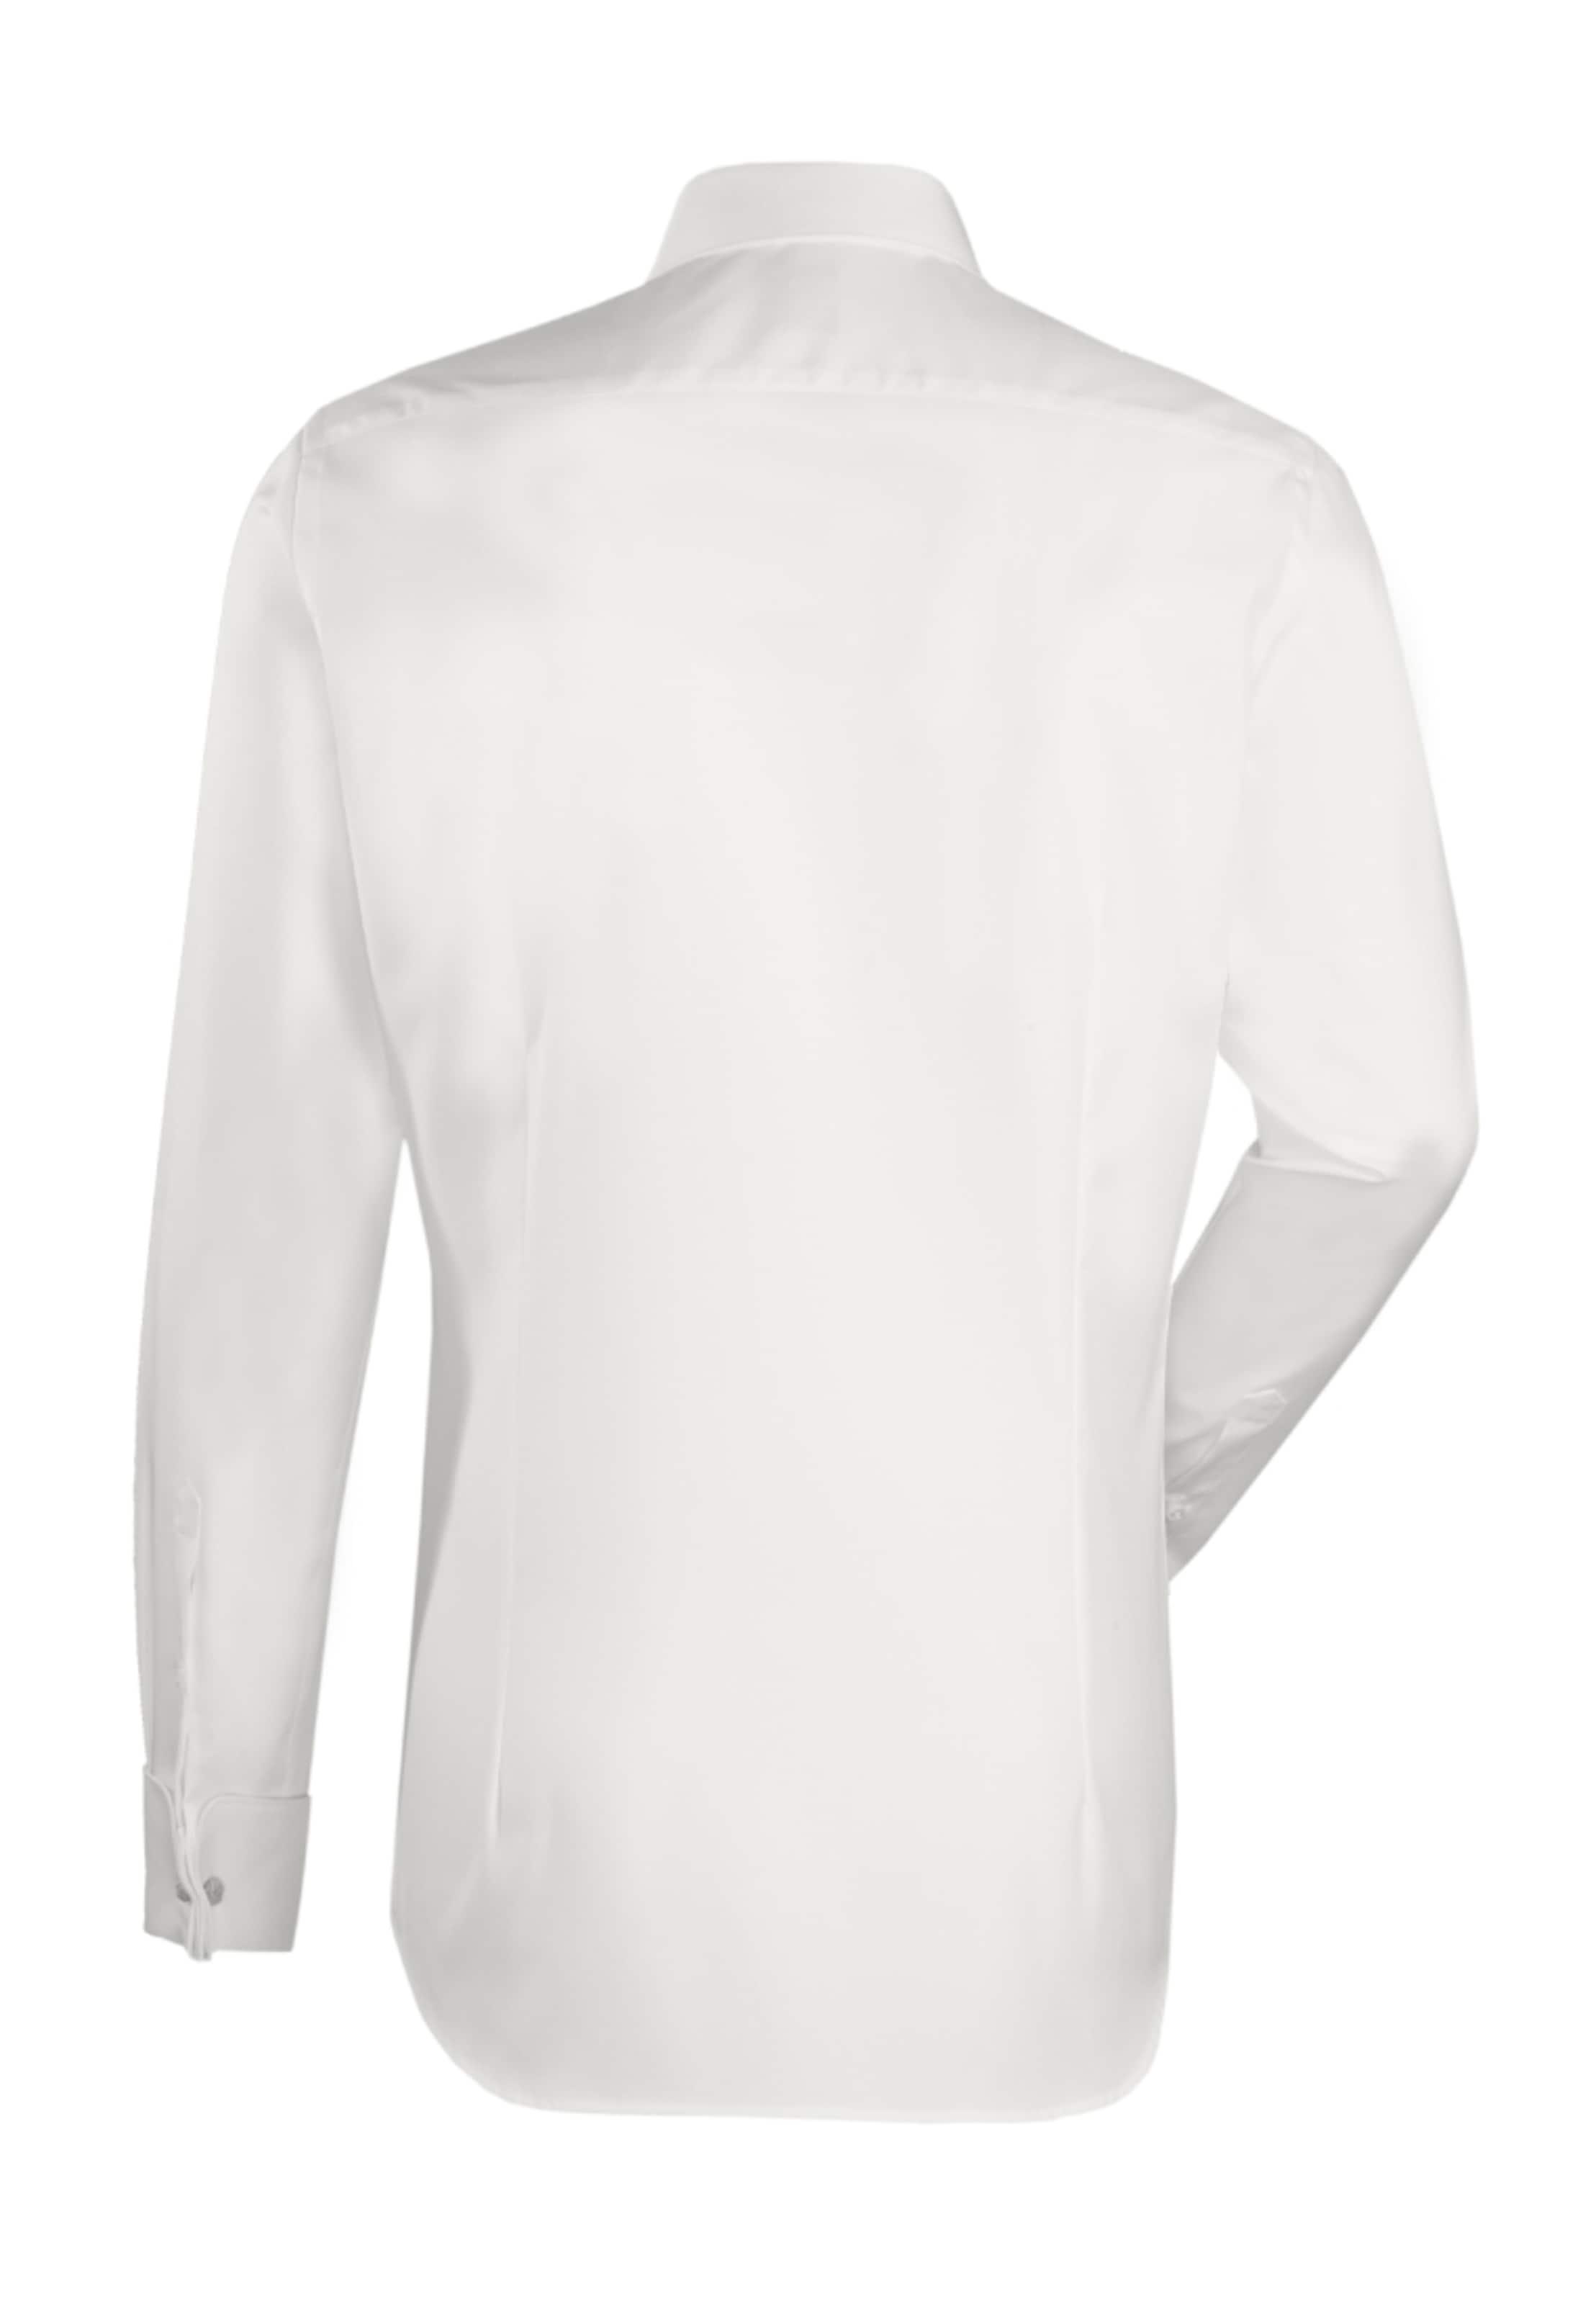 City Britt In Weiß ' Custom Jacques hemd Fit qR35j4ALc